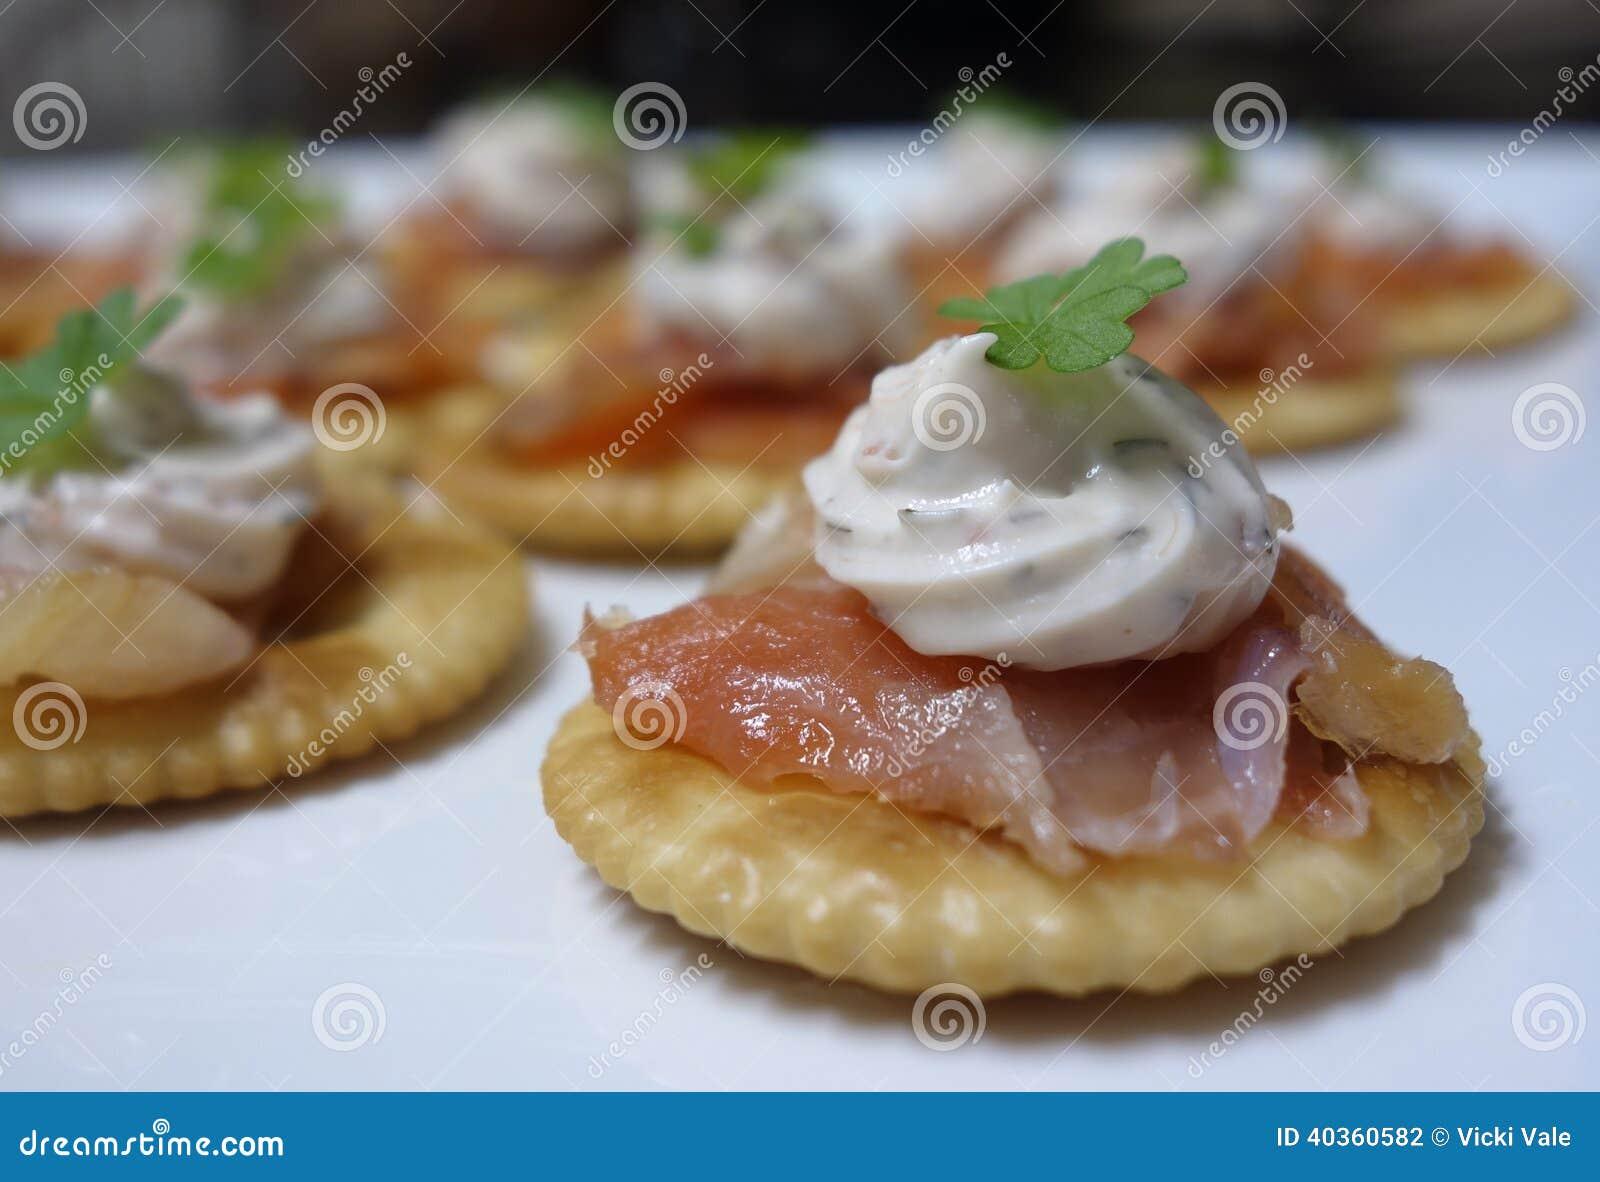 Smoked Salmon Canapes. Stock Photo - Image: 40360582